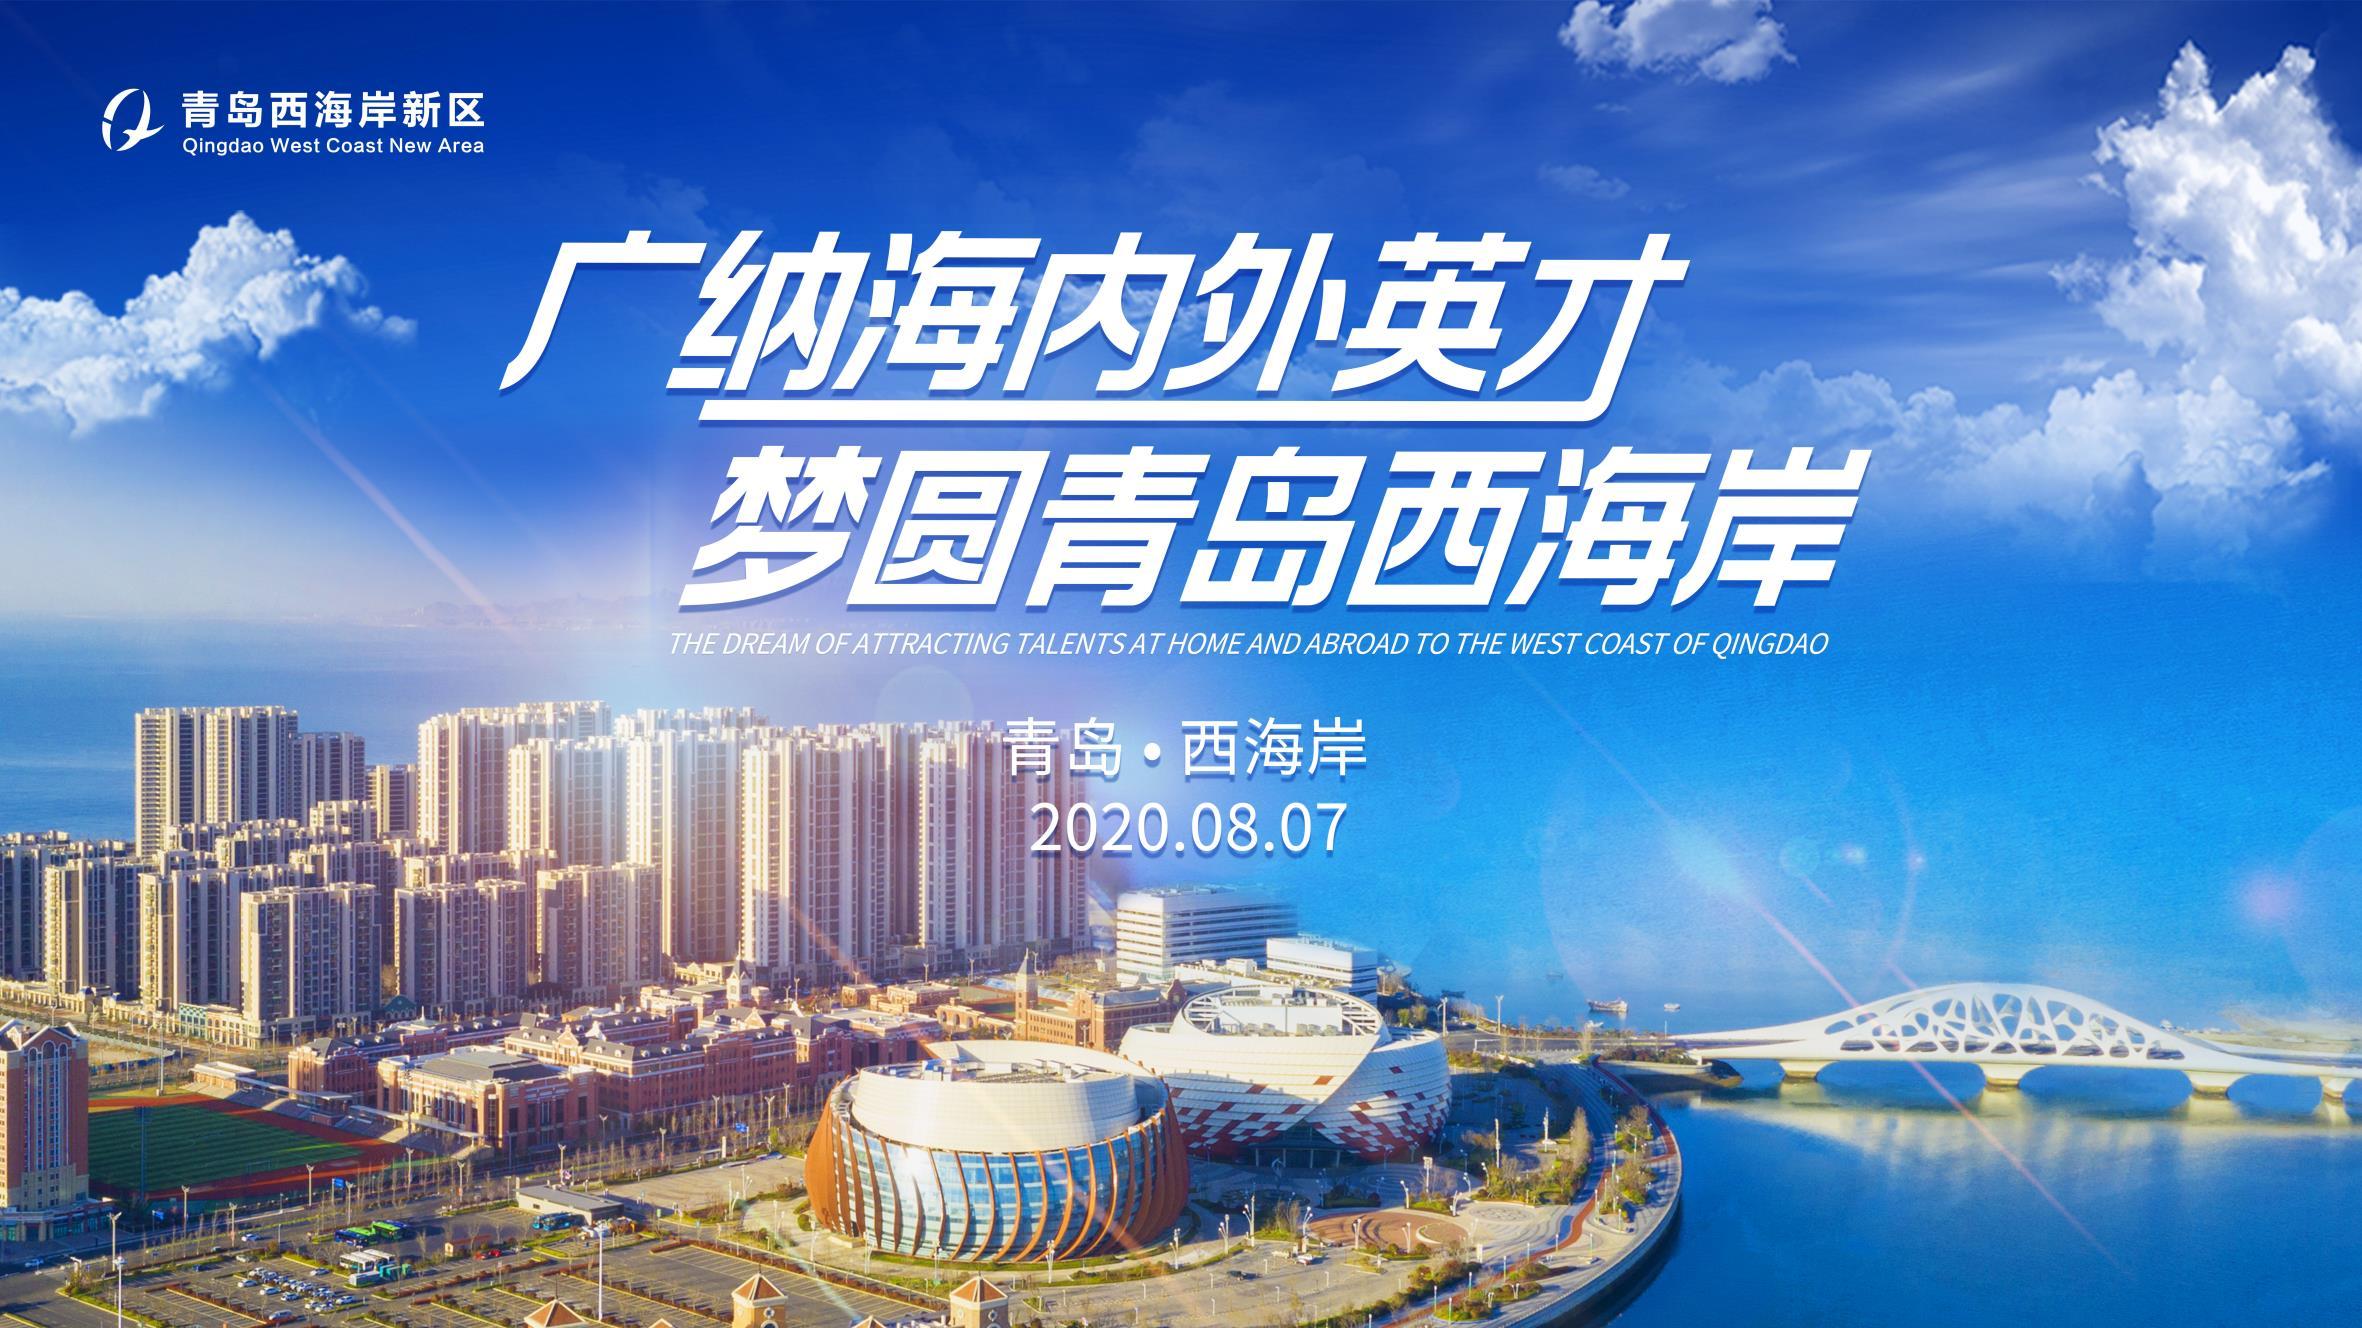 http://live.qingdaonews.com/live/public/attachs/live/202008/07/57c9b84907112fd0dd50f169d89f5ac105768f201596780128.jpg